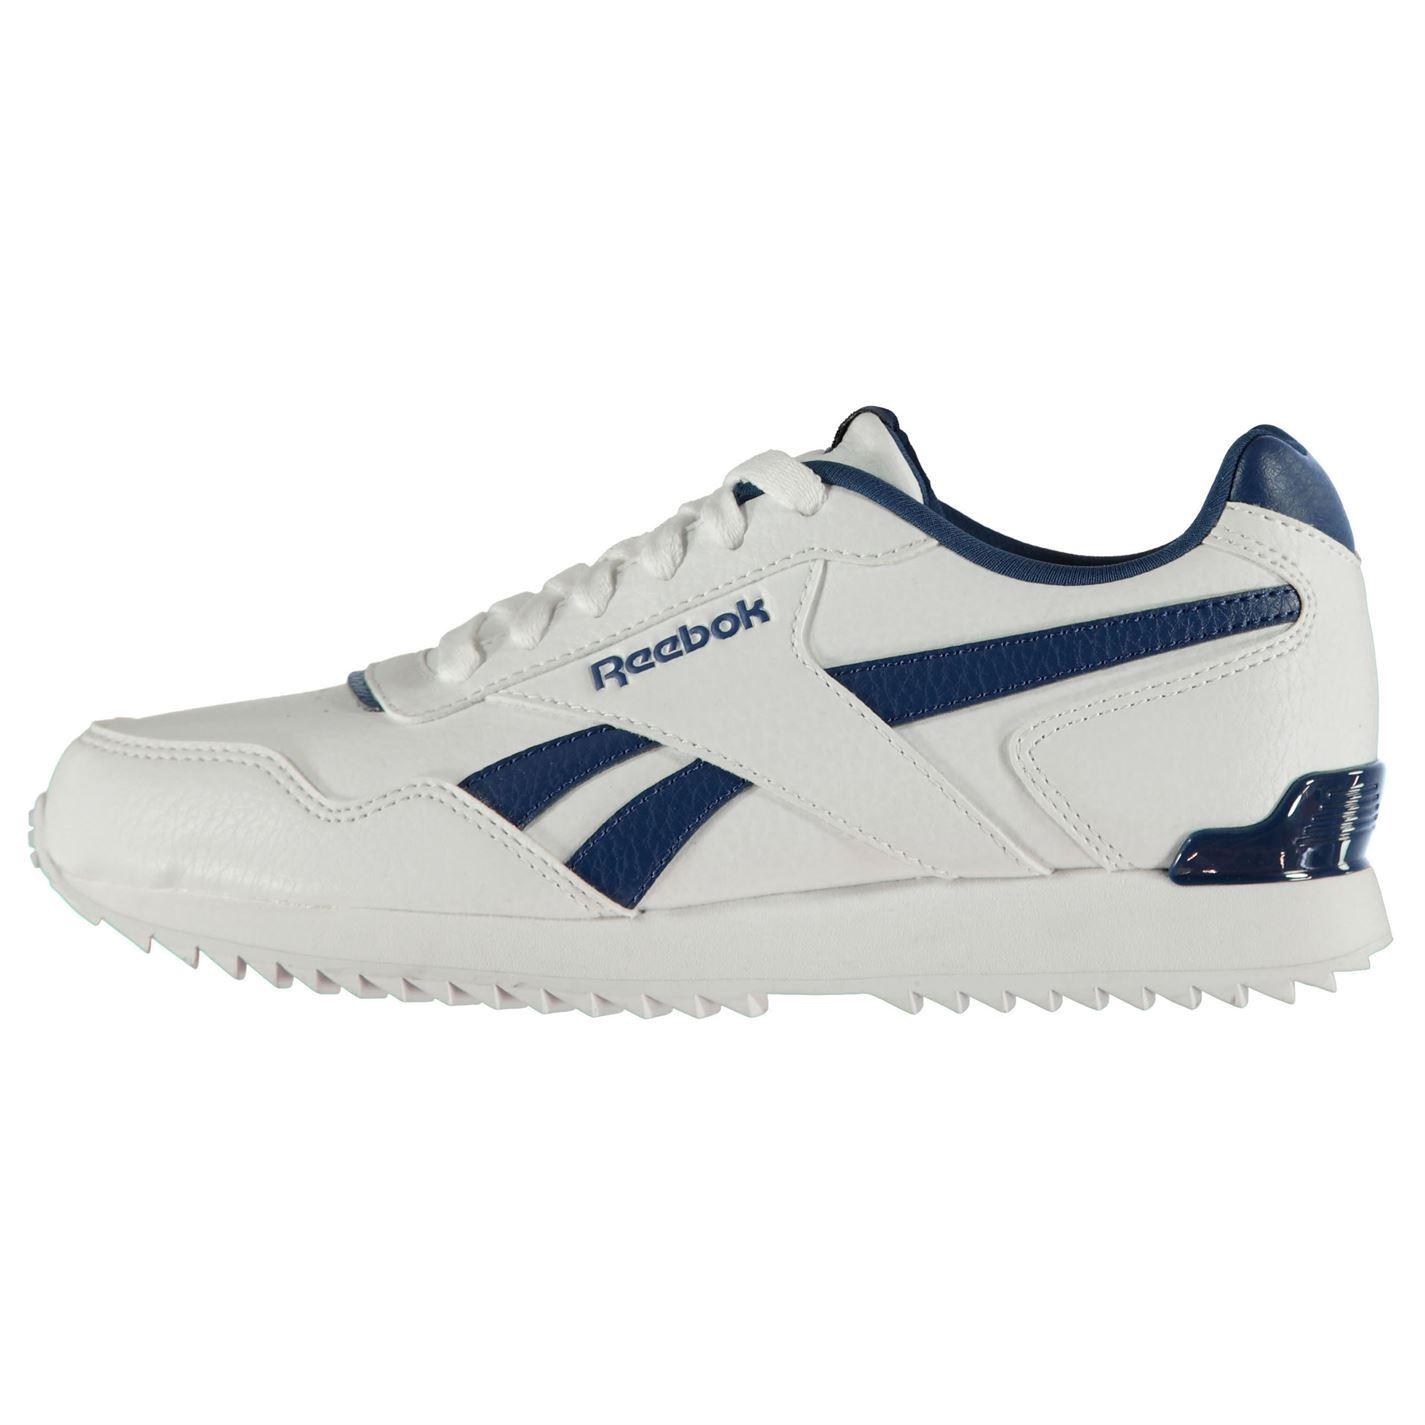 dd44779da1a5f Reebok-Royal-Glide-Trainers-Junior-Boys-Shoes-Footwear thumbnail